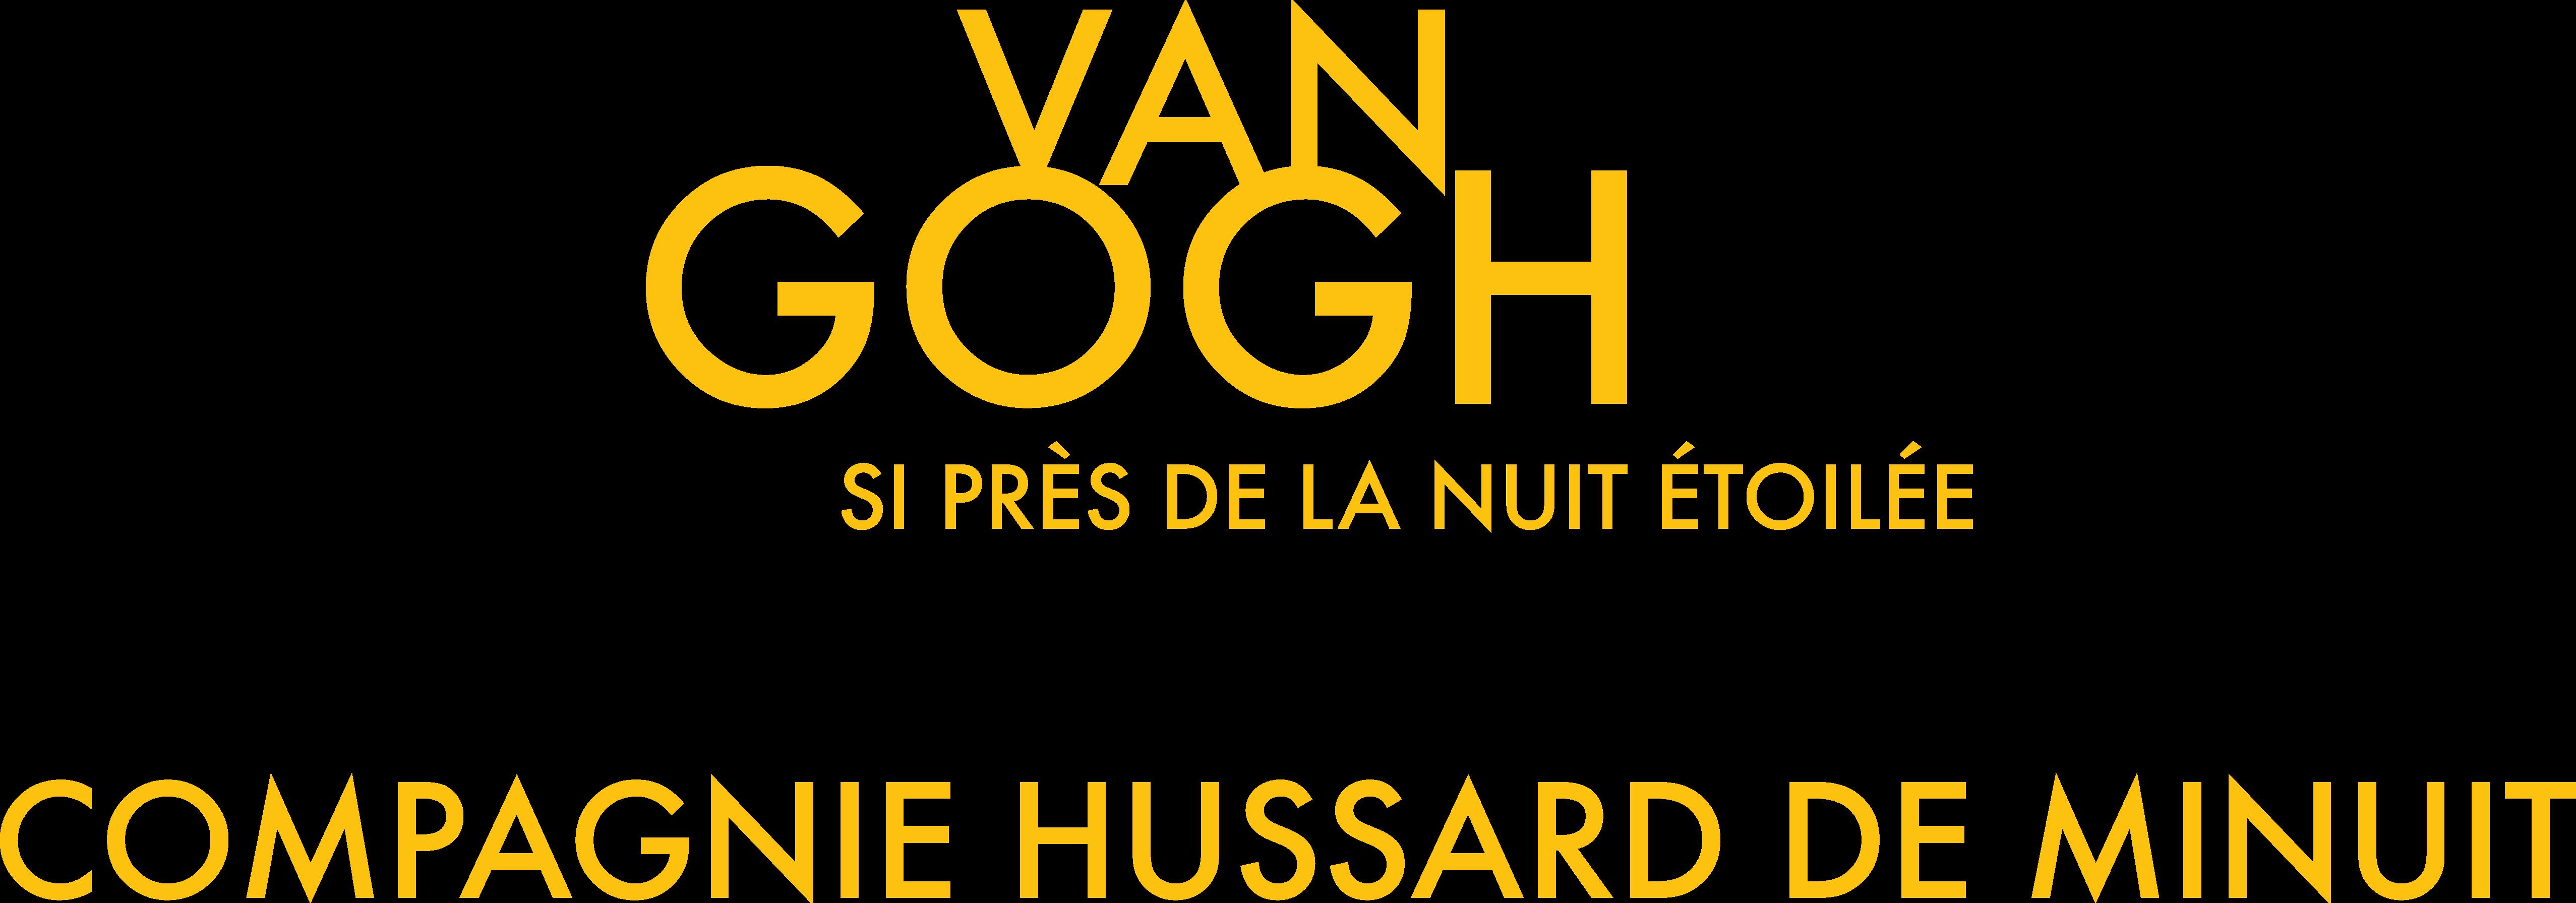 COMPAGNIE HUSSARD DE MINUIT